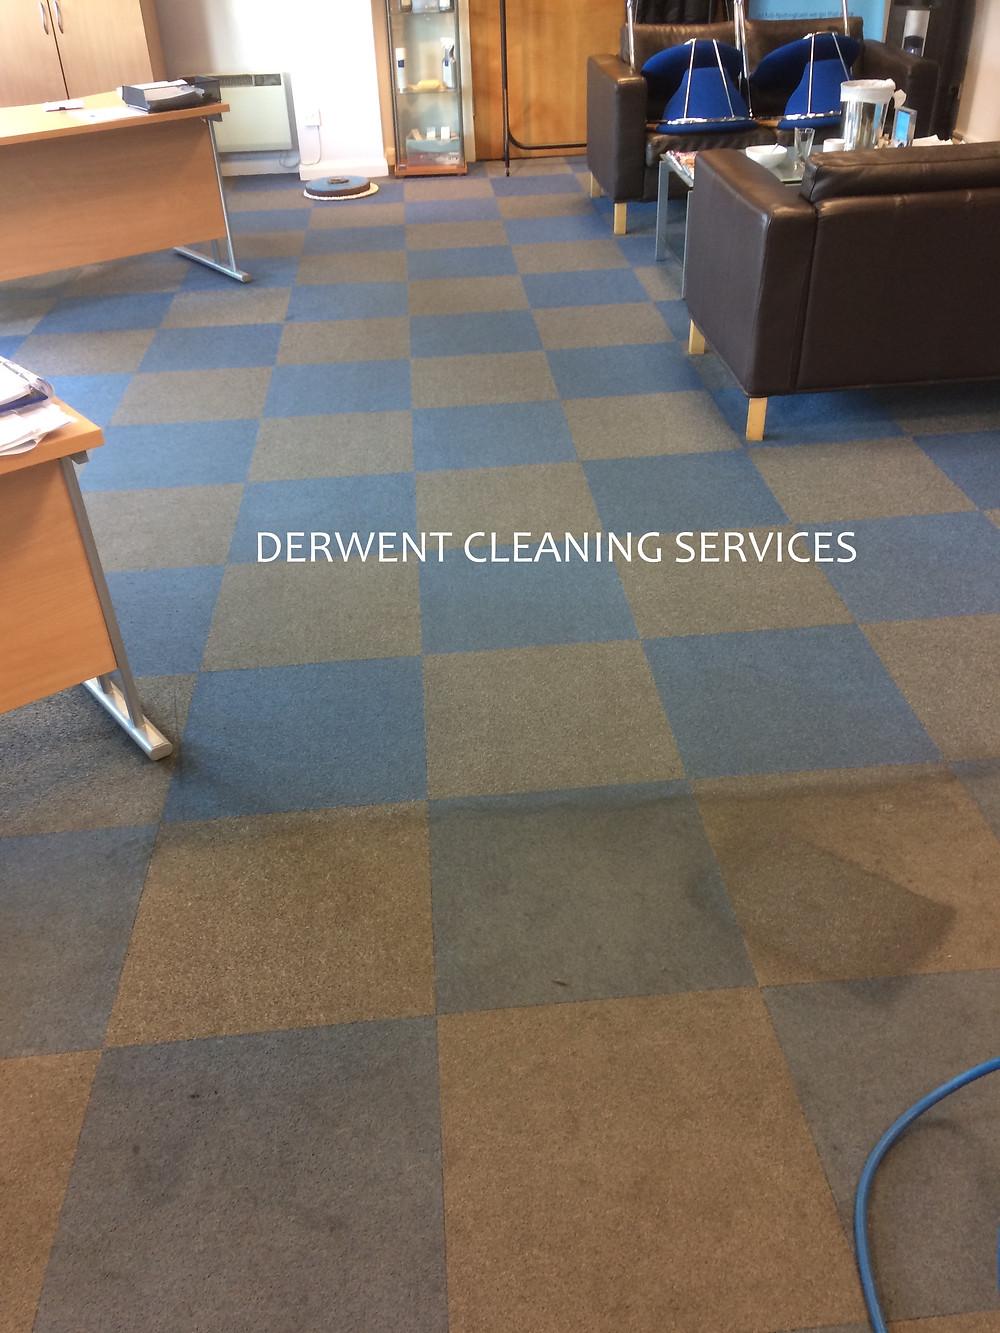 A busy Mercedes service centre gets the Derwent treatment.